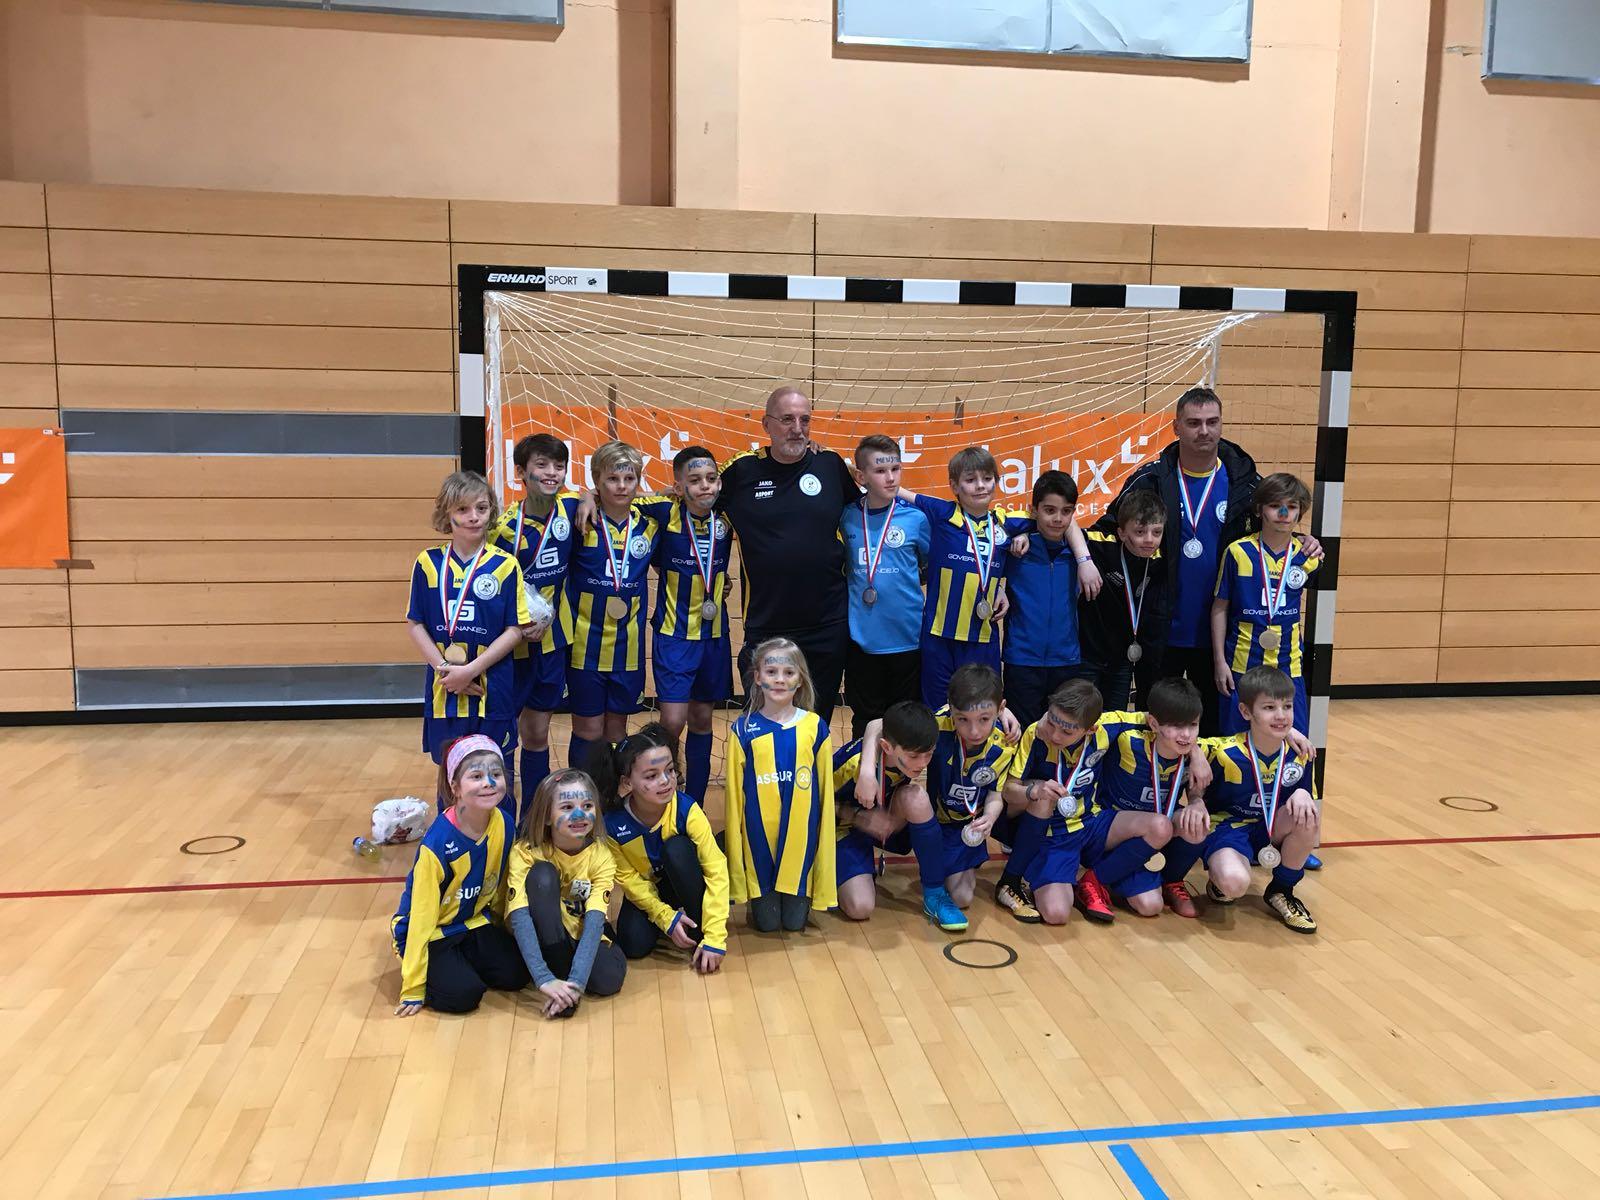 Final LaLux Indoor Cup - Poussins 2018